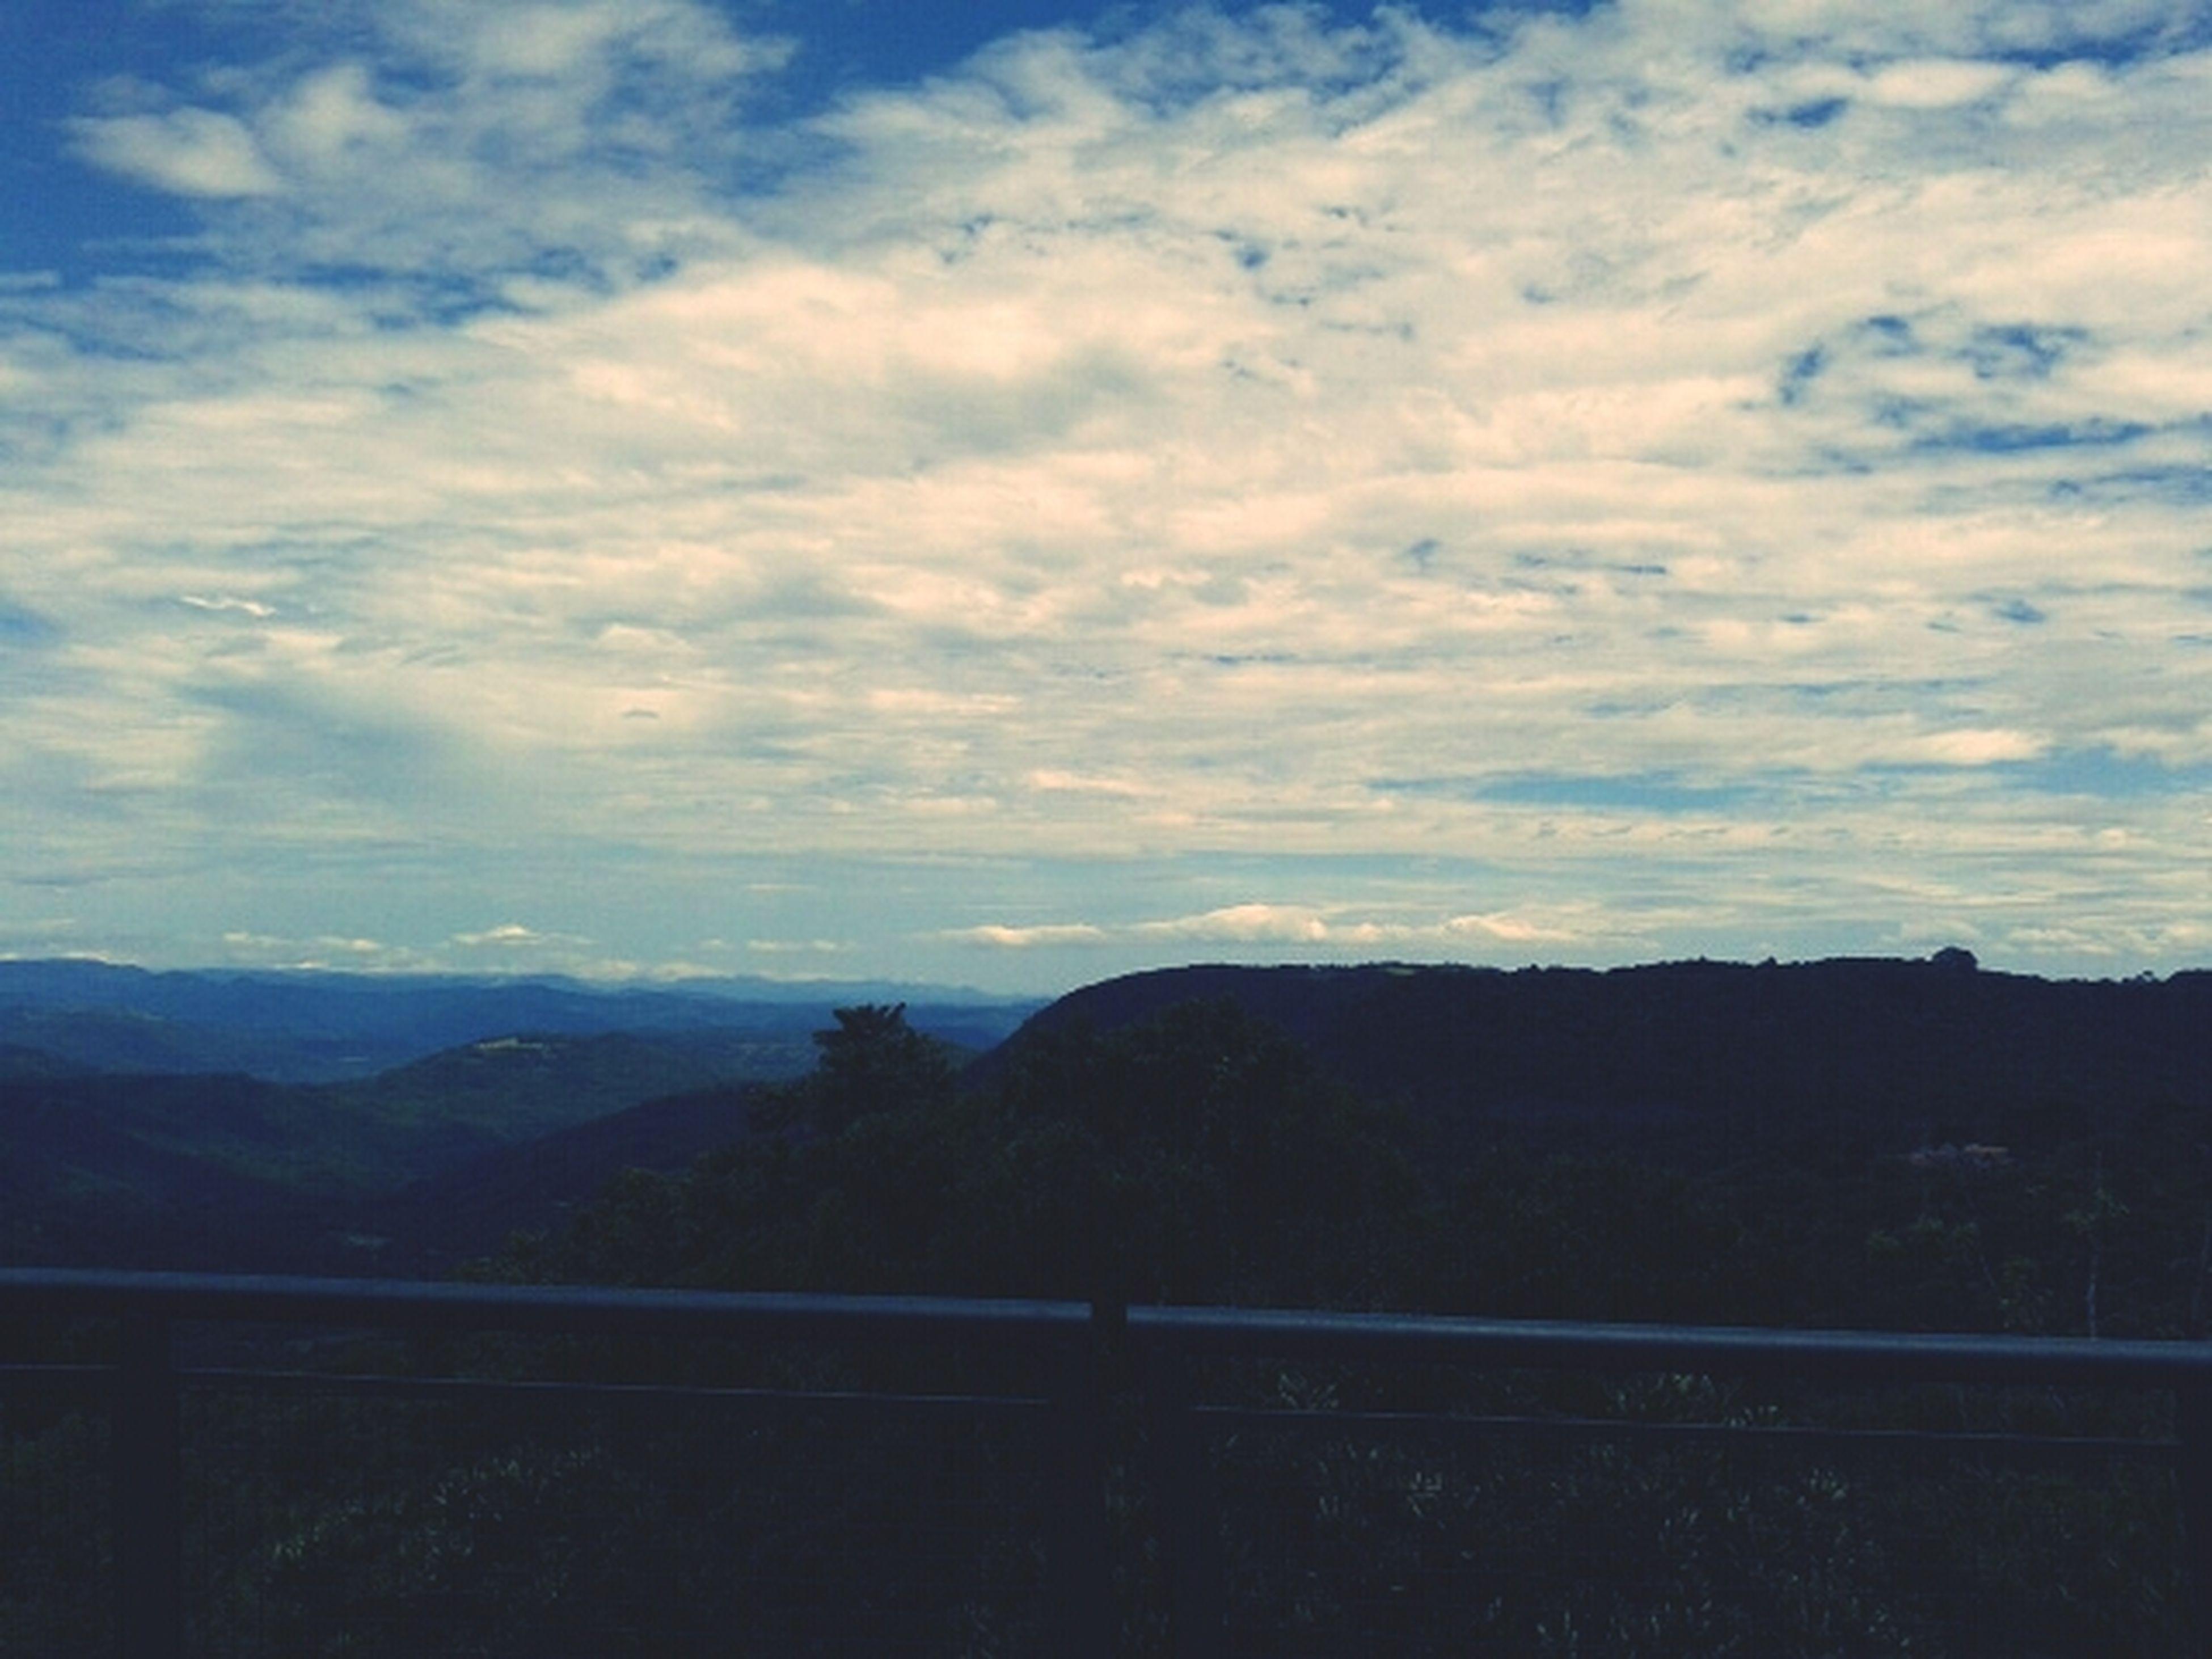 mountain, mountain range, tranquil scene, sky, tranquility, scenics, beauty in nature, cloud - sky, landscape, nature, silhouette, cloud, idyllic, non-urban scene, cloudy, remote, outdoors, no people, dusk, non urban scene